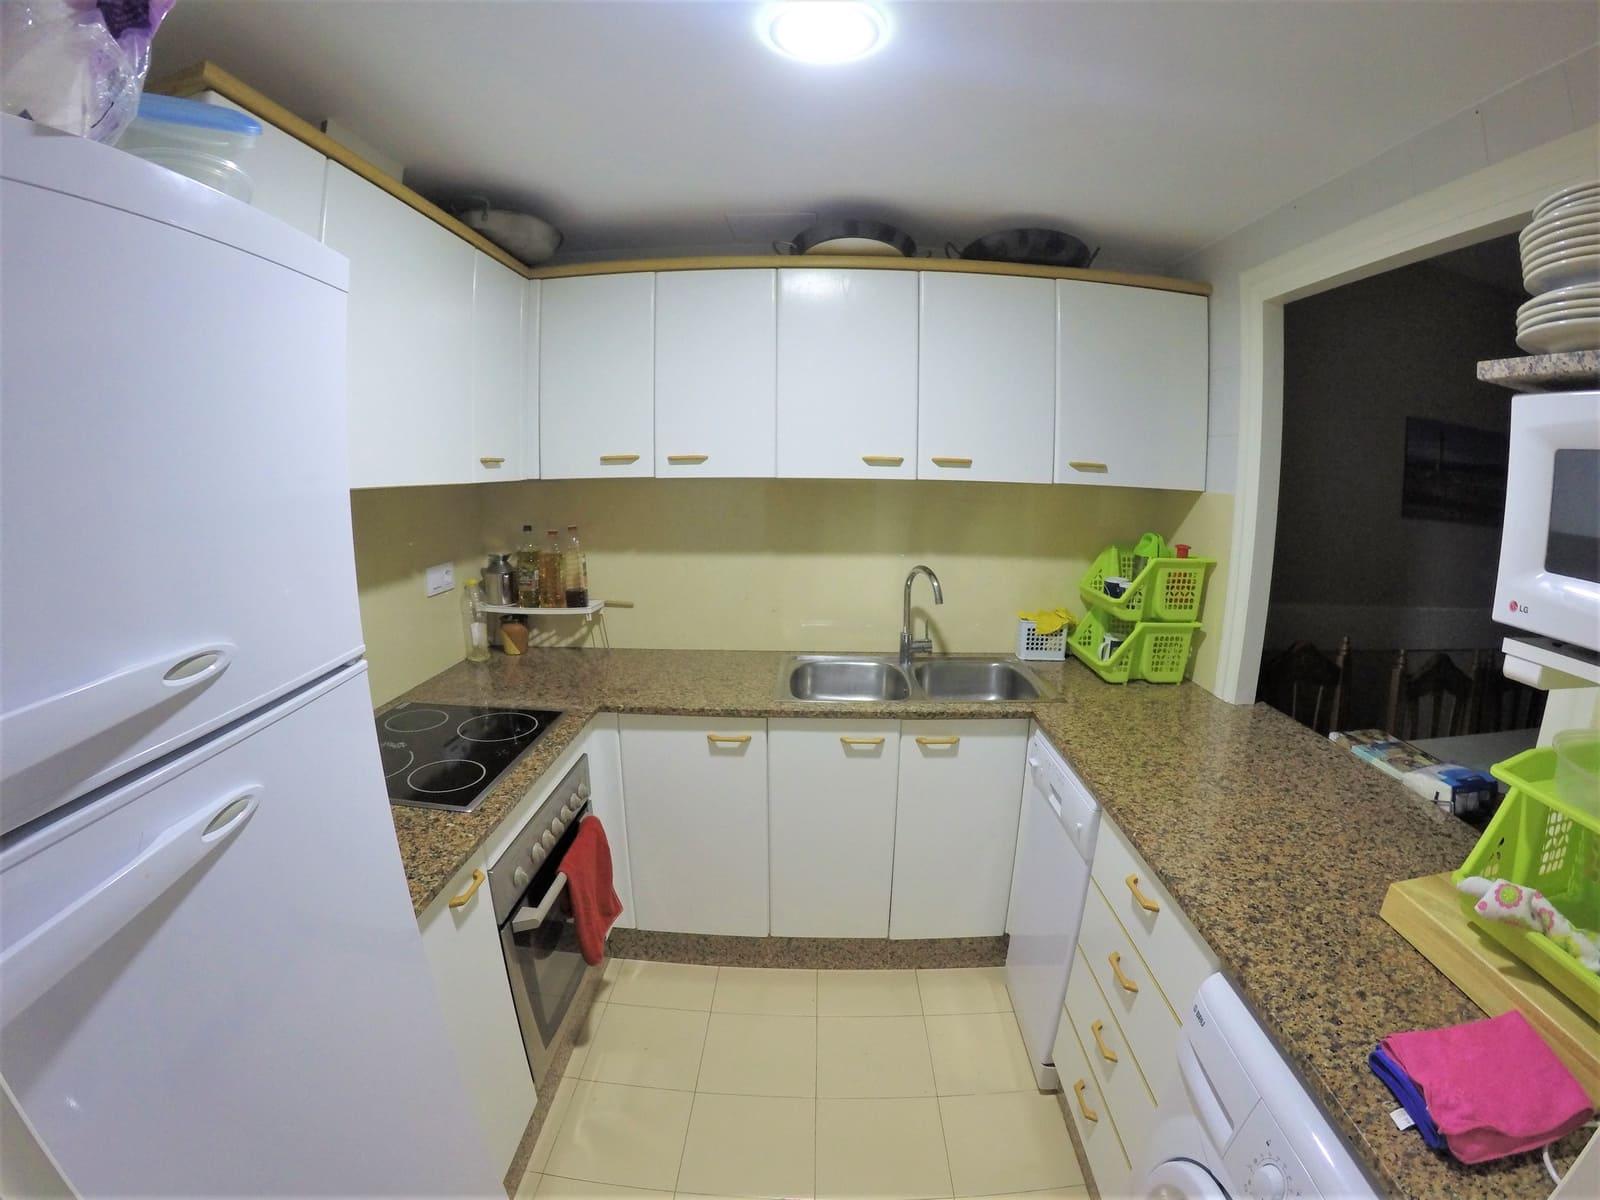 3 chambre Villa/Maison Mitoyenne à vendre à L'Ampolla avec piscine - 180 000 € (Ref: 4227081)